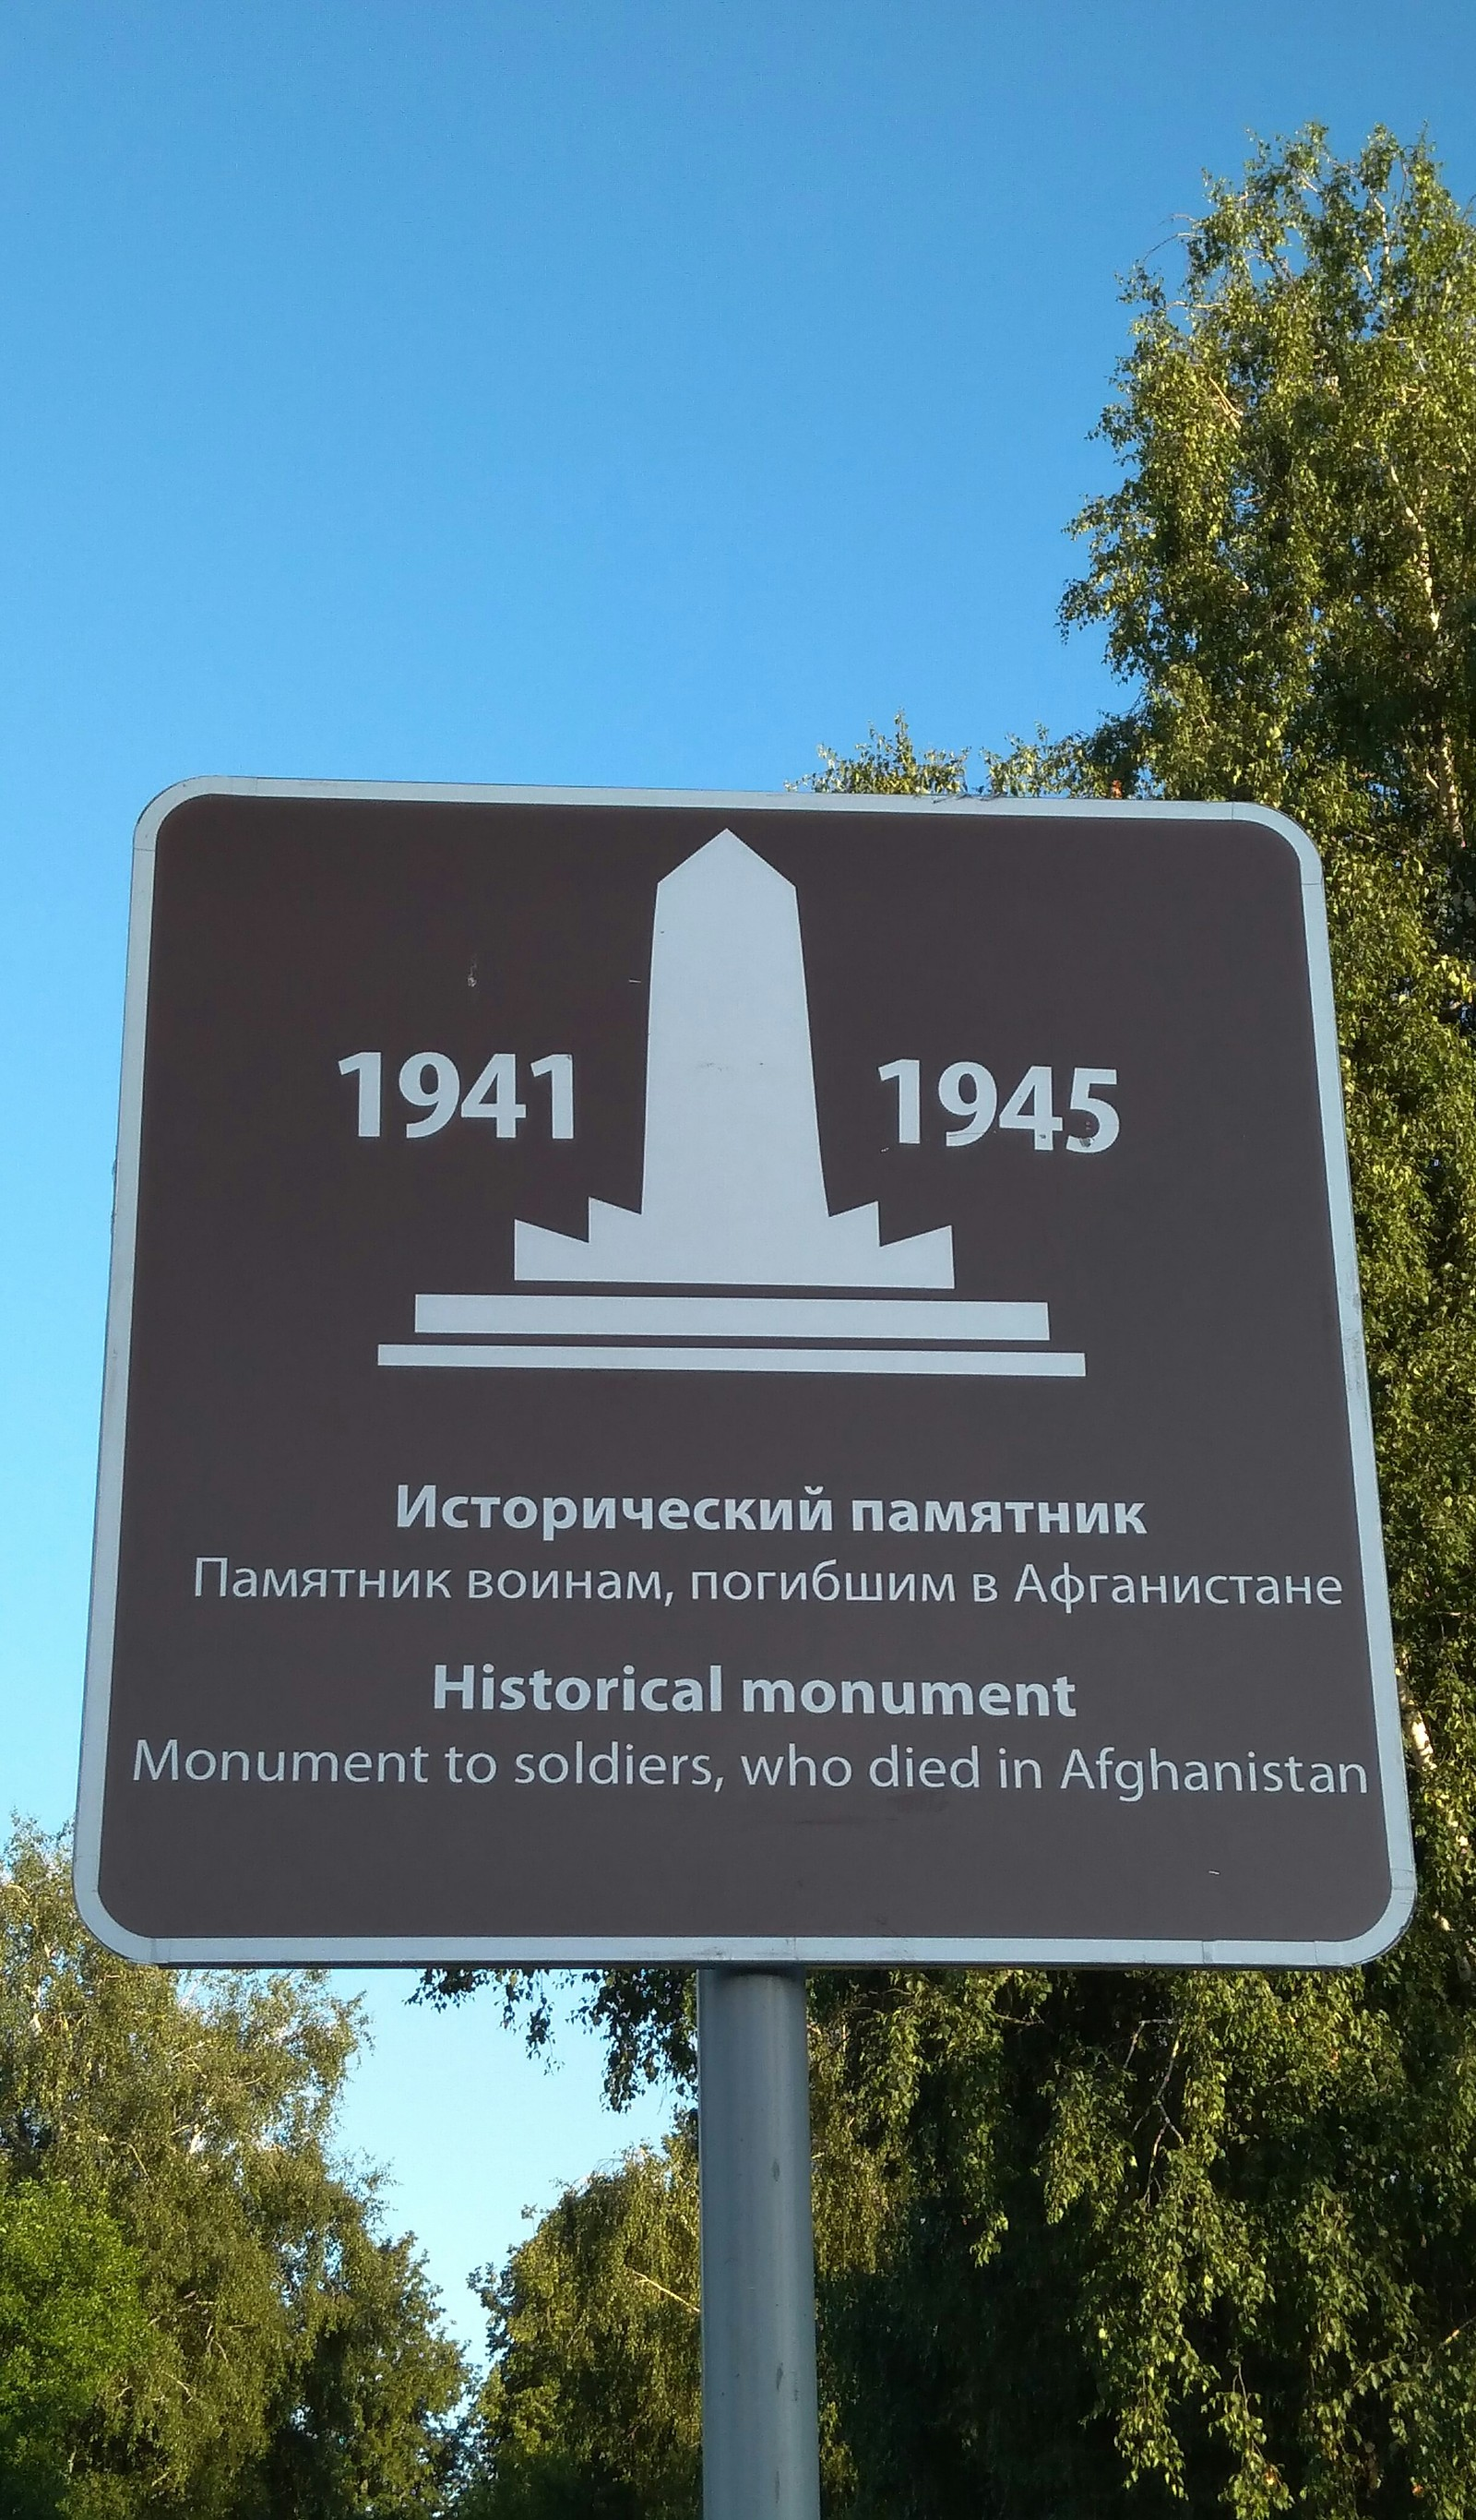 Мяу Прайс Тольятти Stuff Без кидалова Петрозаводск